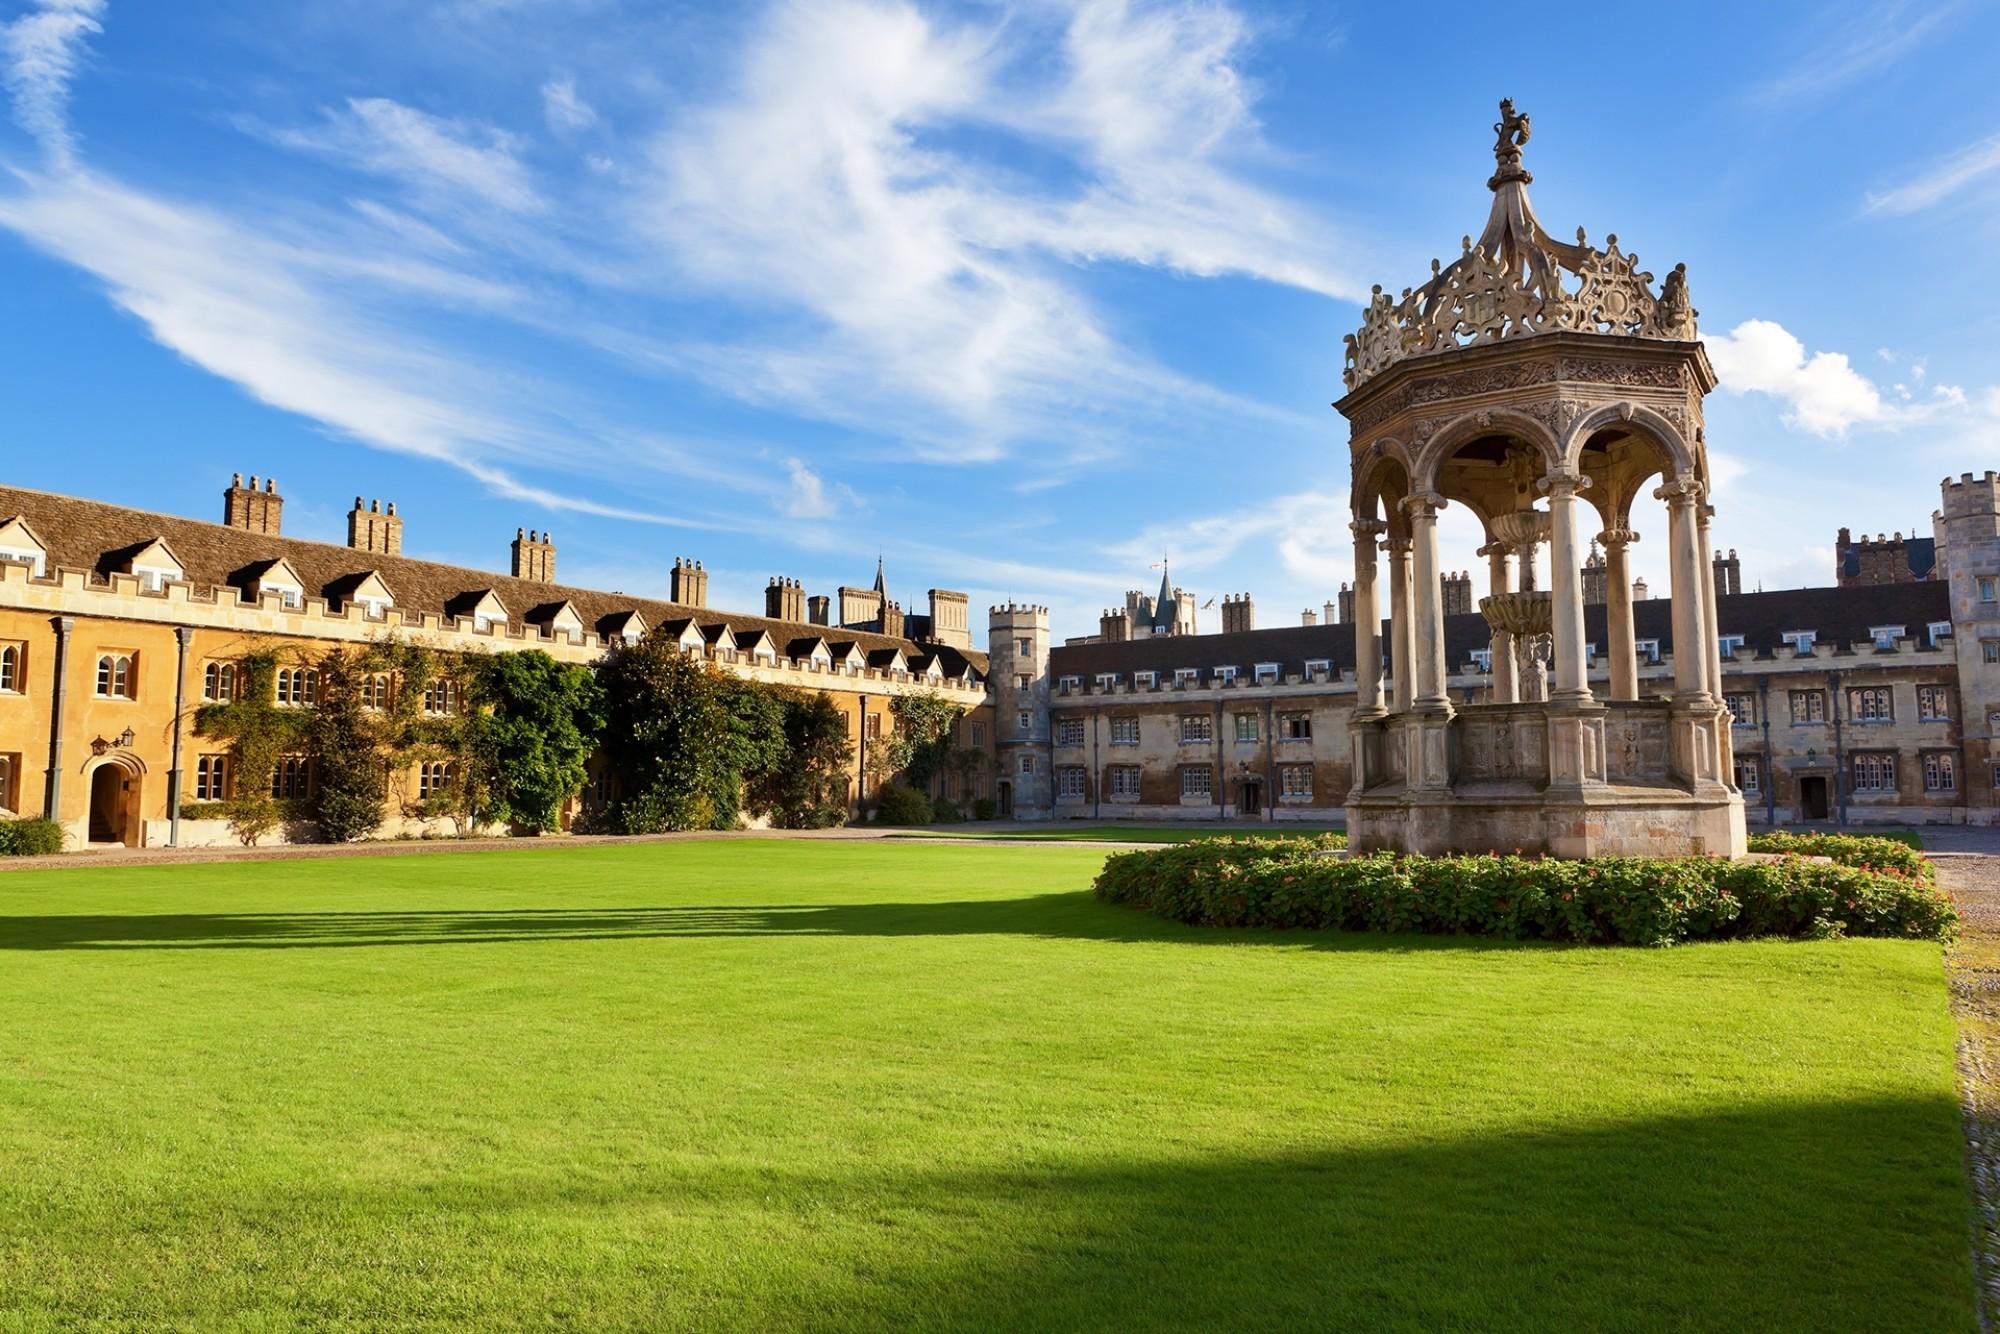 Trinity-College-in-Cambridge-UK